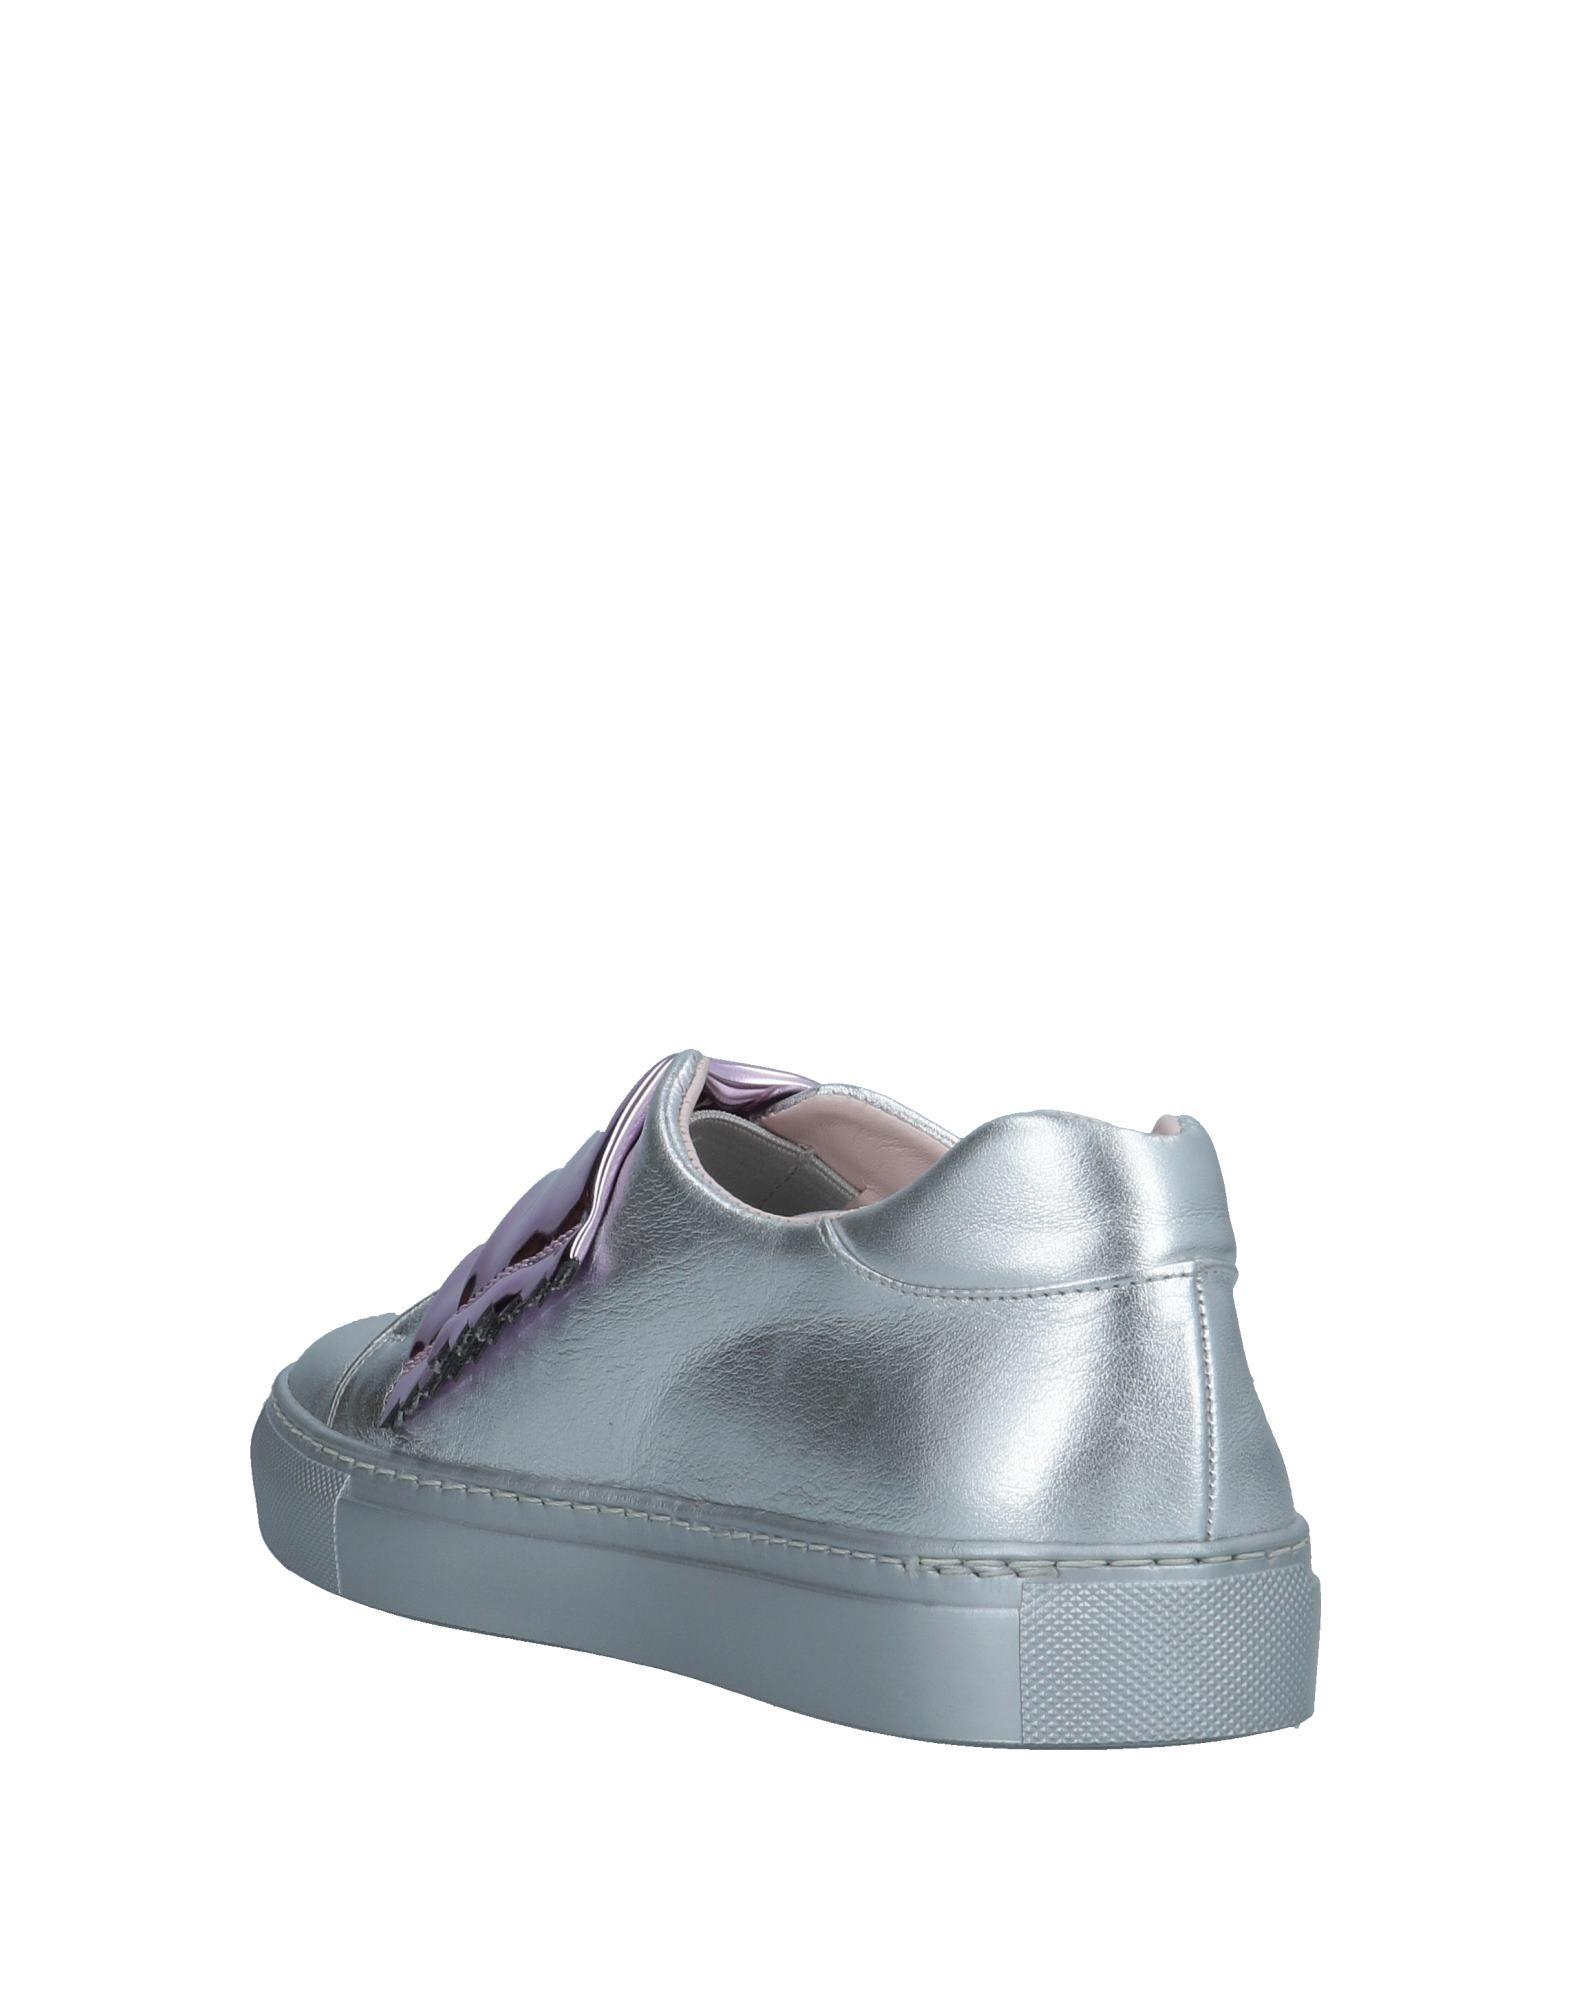 Stilvolle billige Schuhe Minna Parikka Sneakers Sneakers Sneakers Damen  11558077EU b8c896